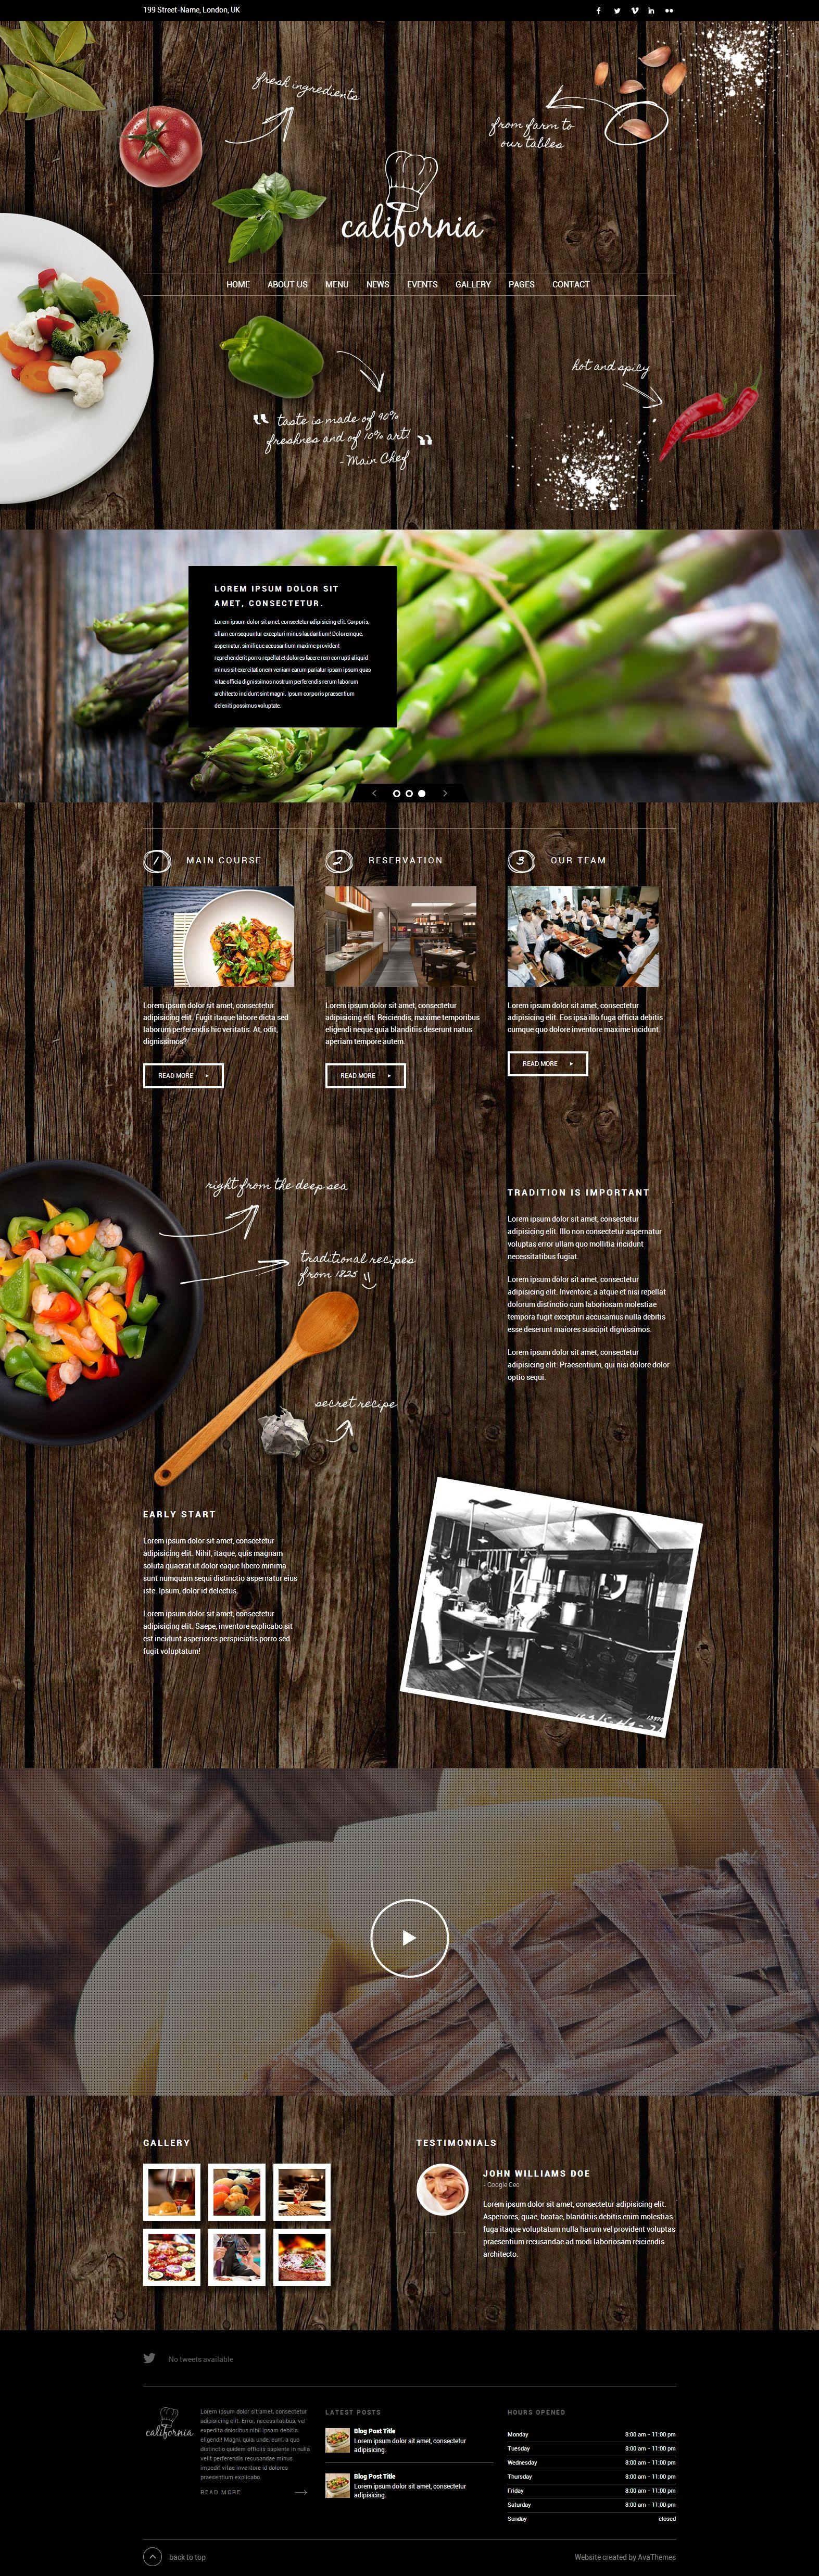 California - Restaurant Hotel Coffee Bar Website #web #design #restaurant http://www.amazon.com/gp/product/B018P97X0C